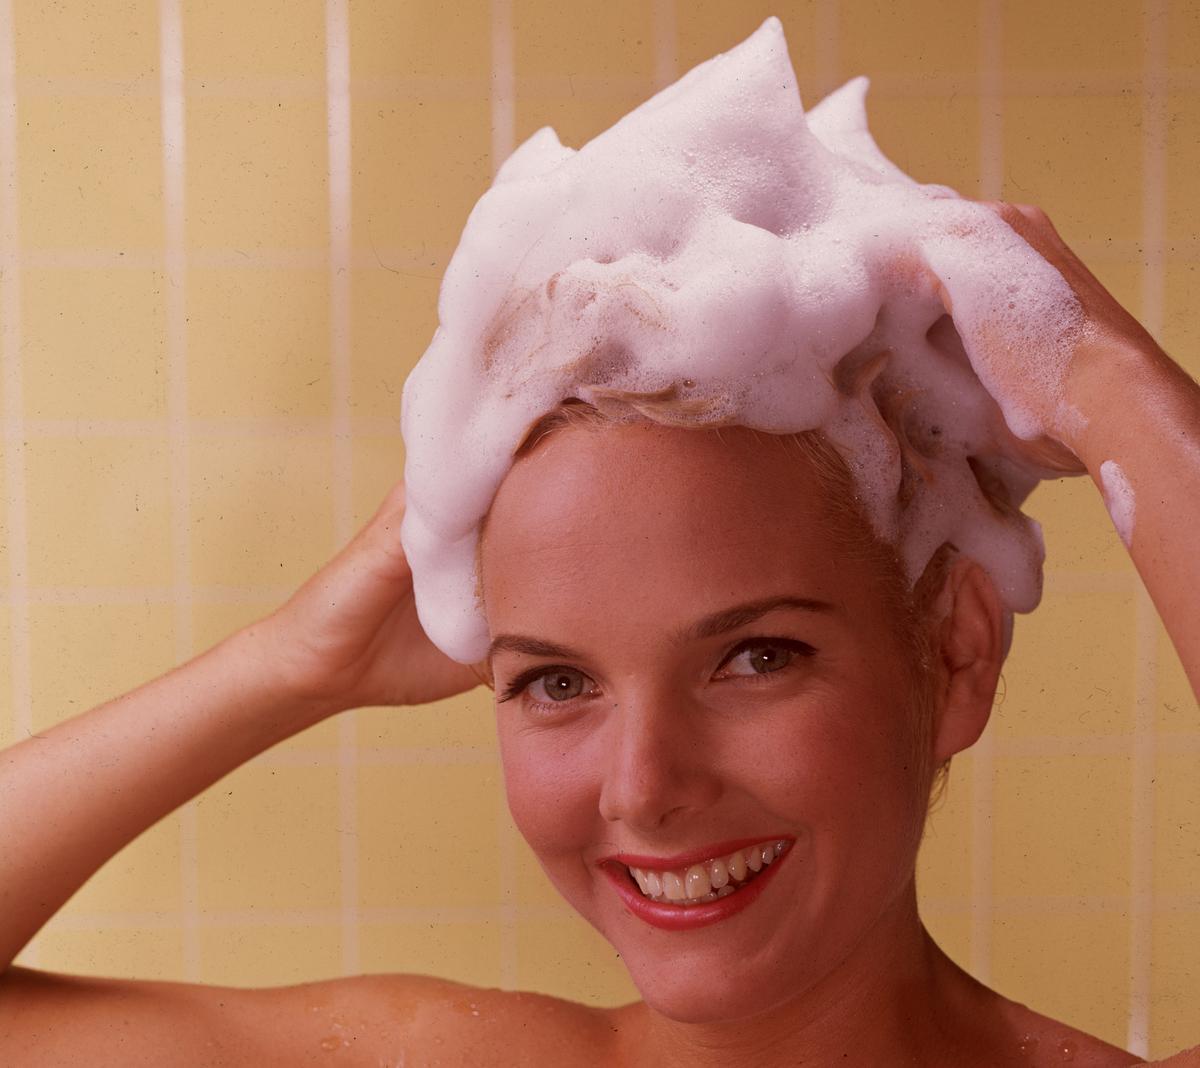 A woman lathers shampoo into her hair circa 1960